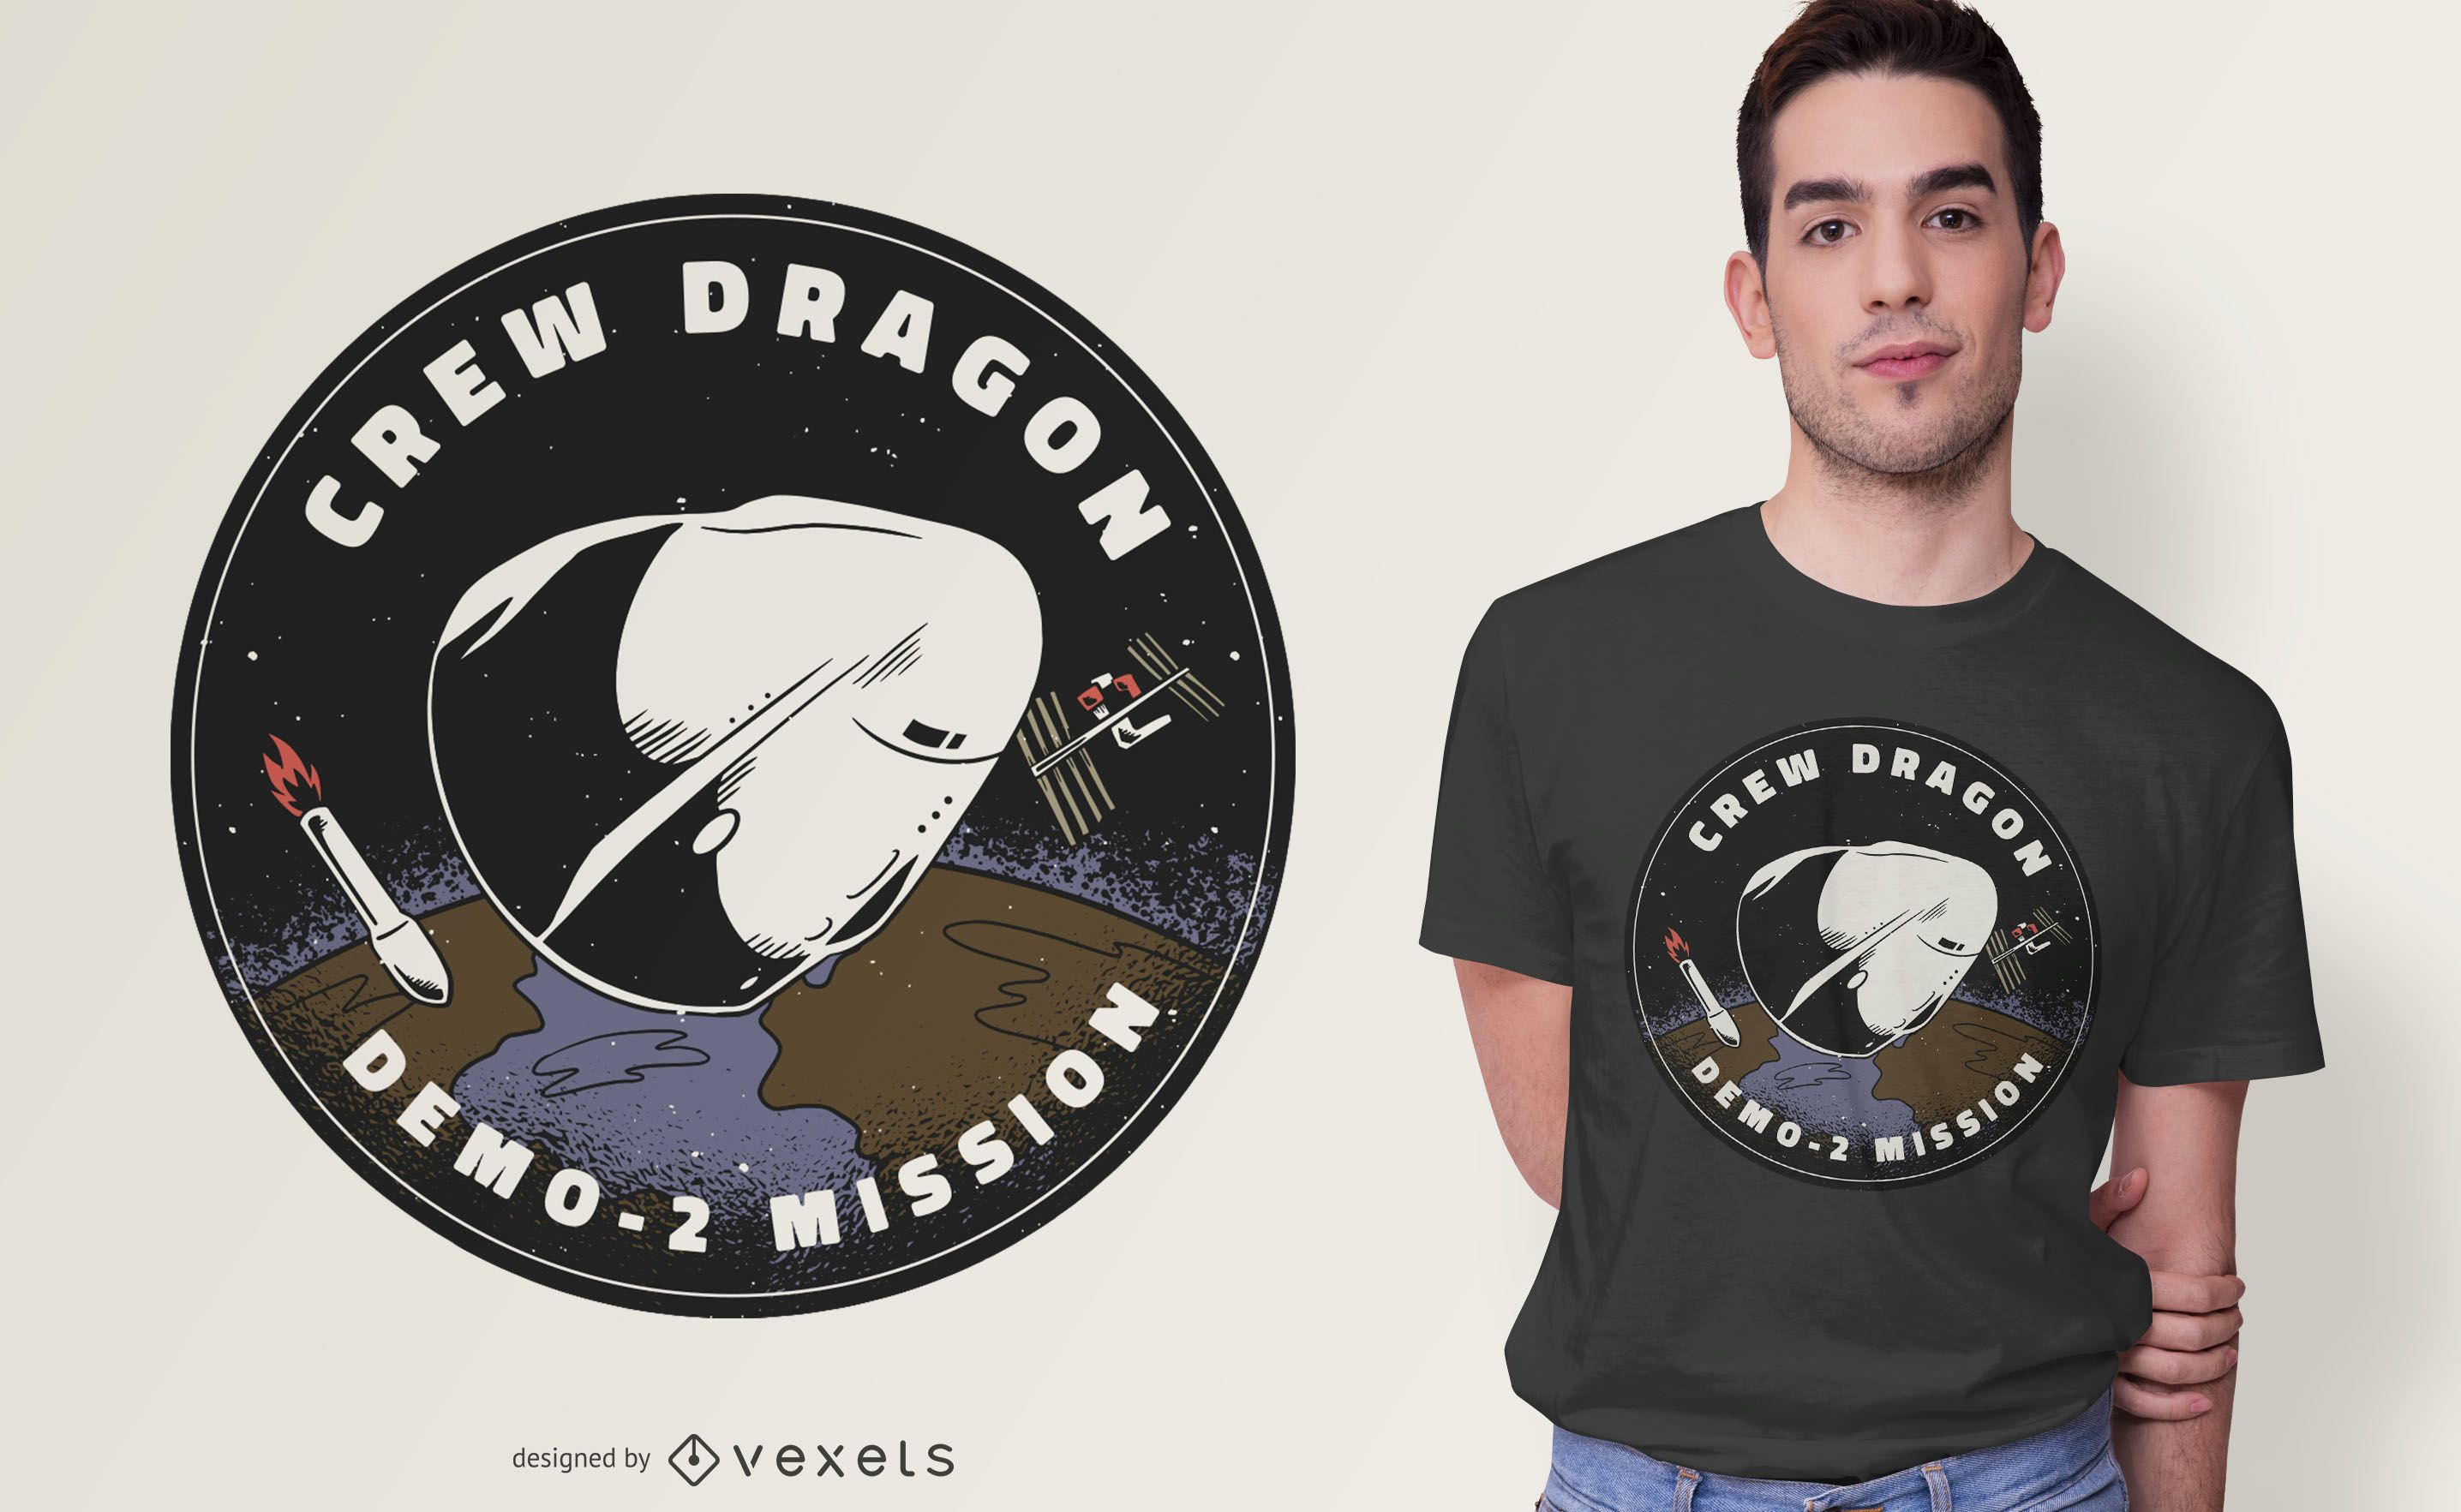 Crew Dragon Patch T-shirt Design